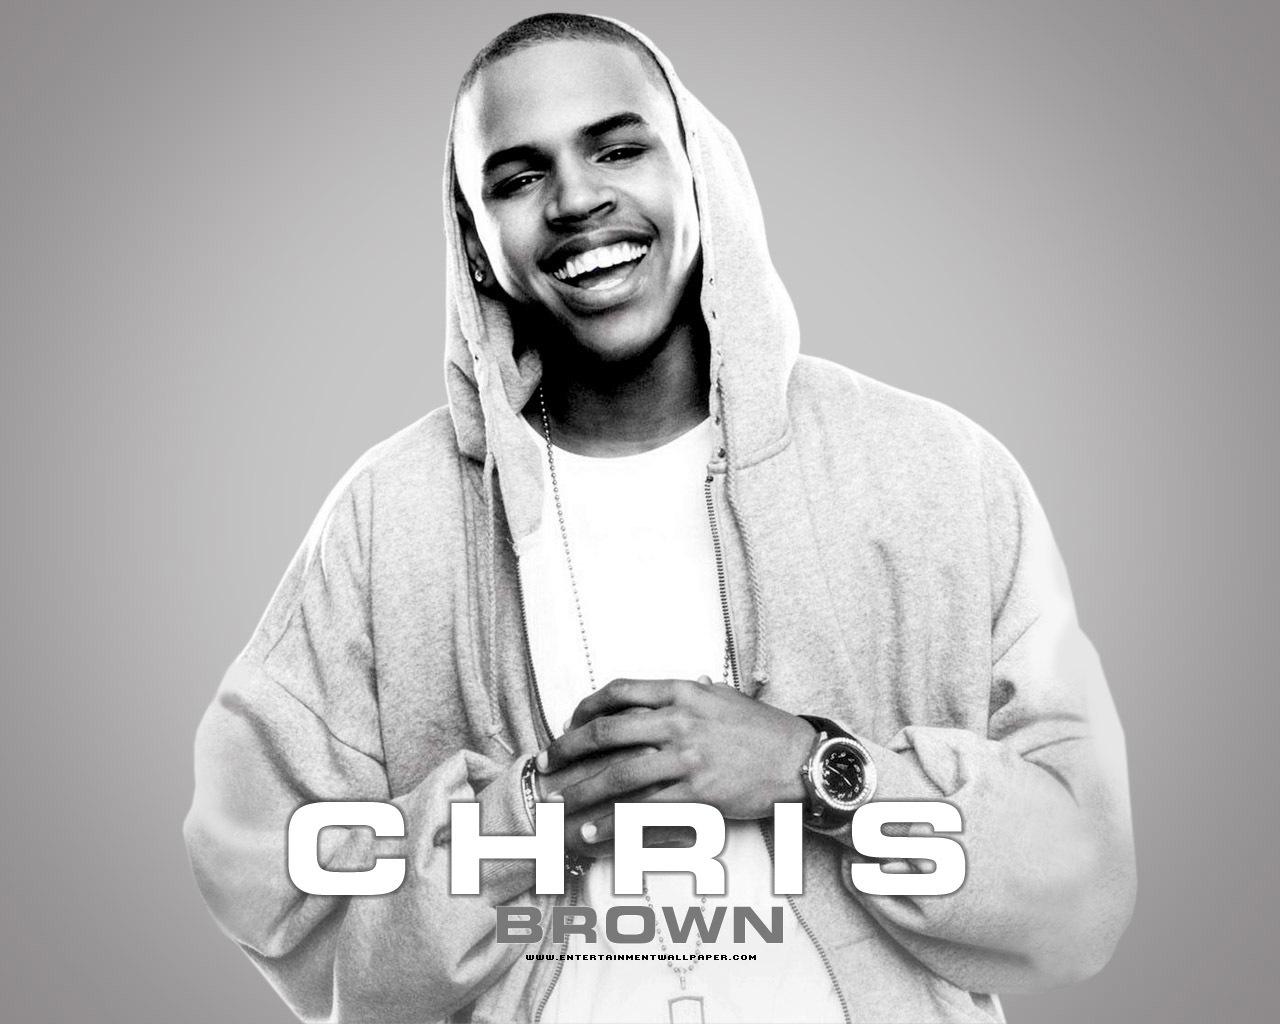 Chris Brown Wallpaper 48 Wallpapers Adorable